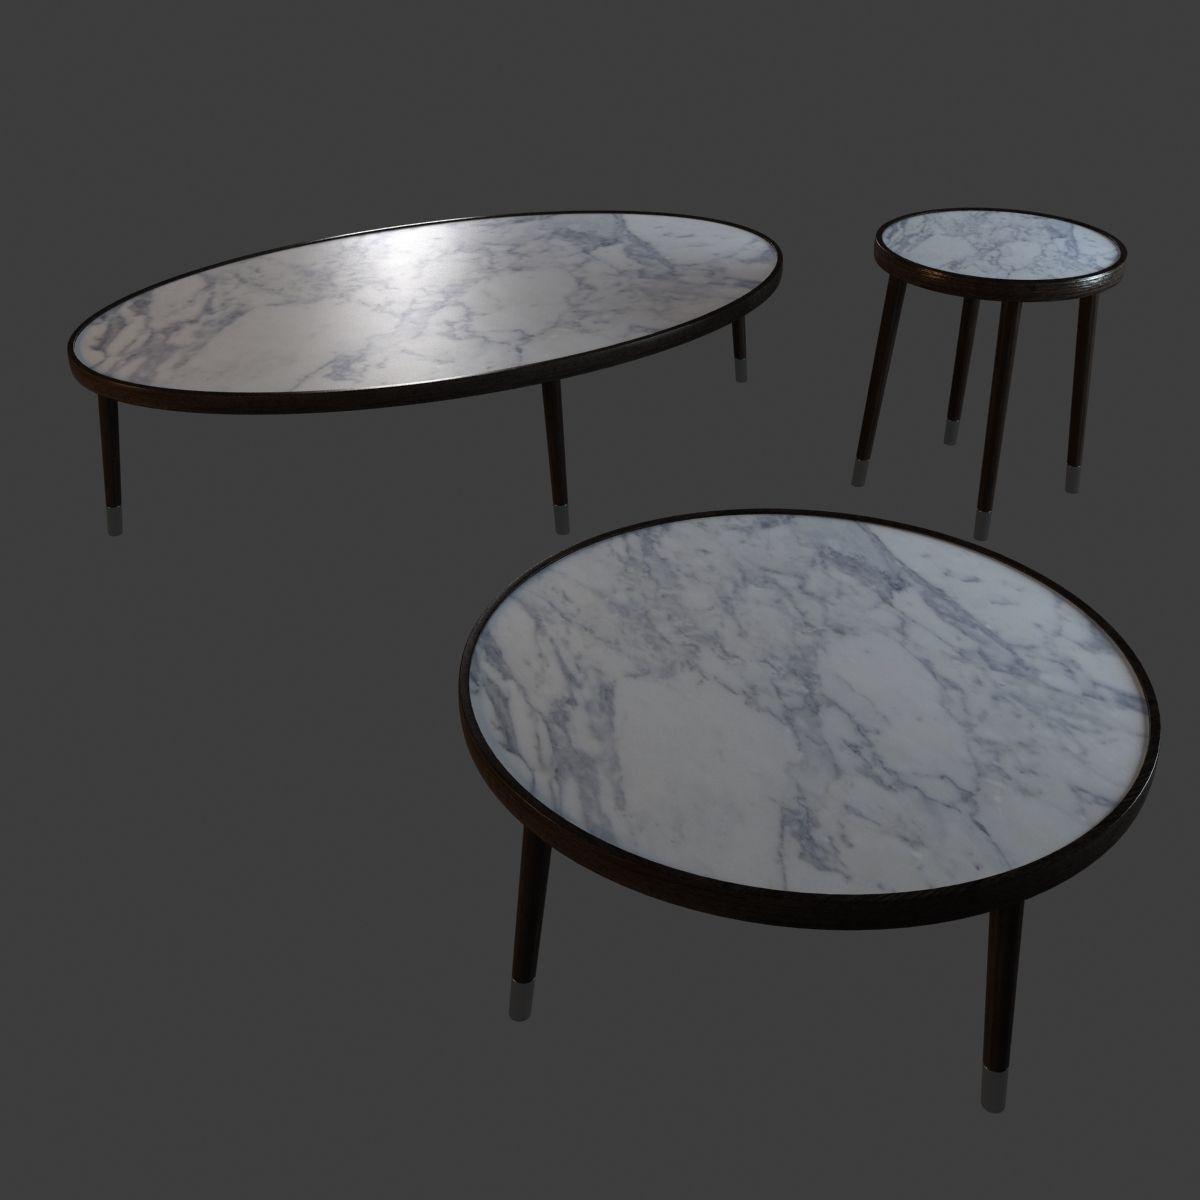 Bigne Porada Coffee Table 3d Model Max Obj 3ds Fbx